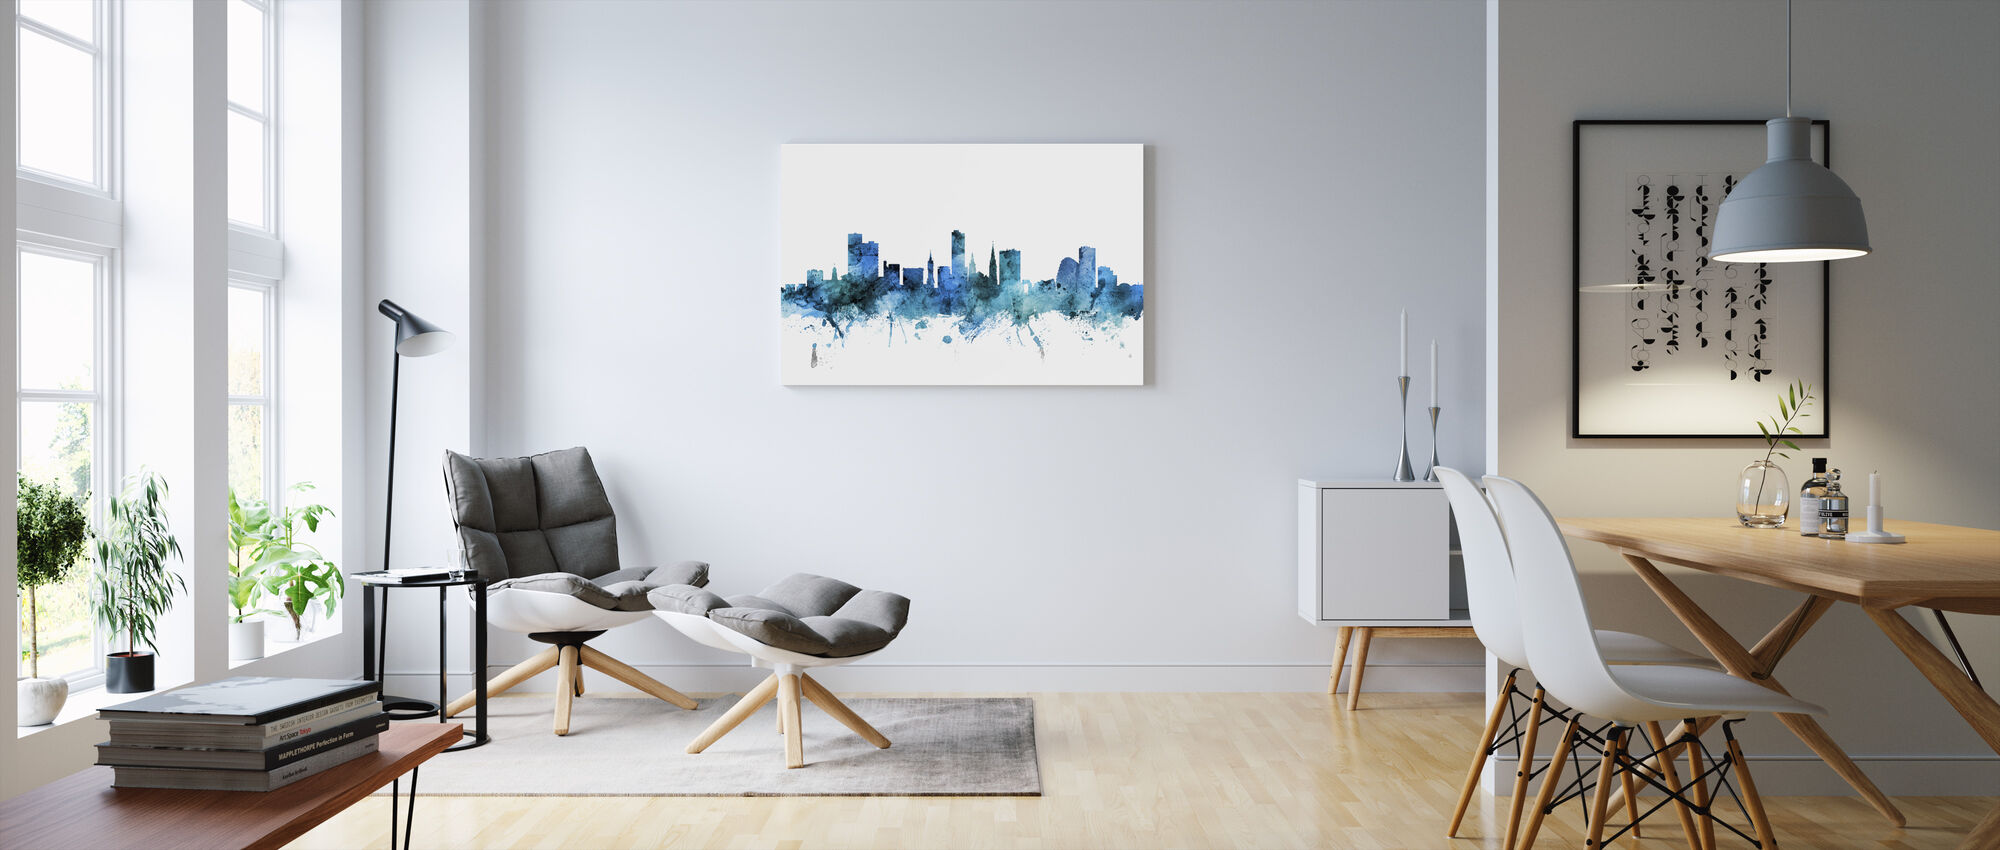 Leicester England Skyline - Canvas print - Living Room